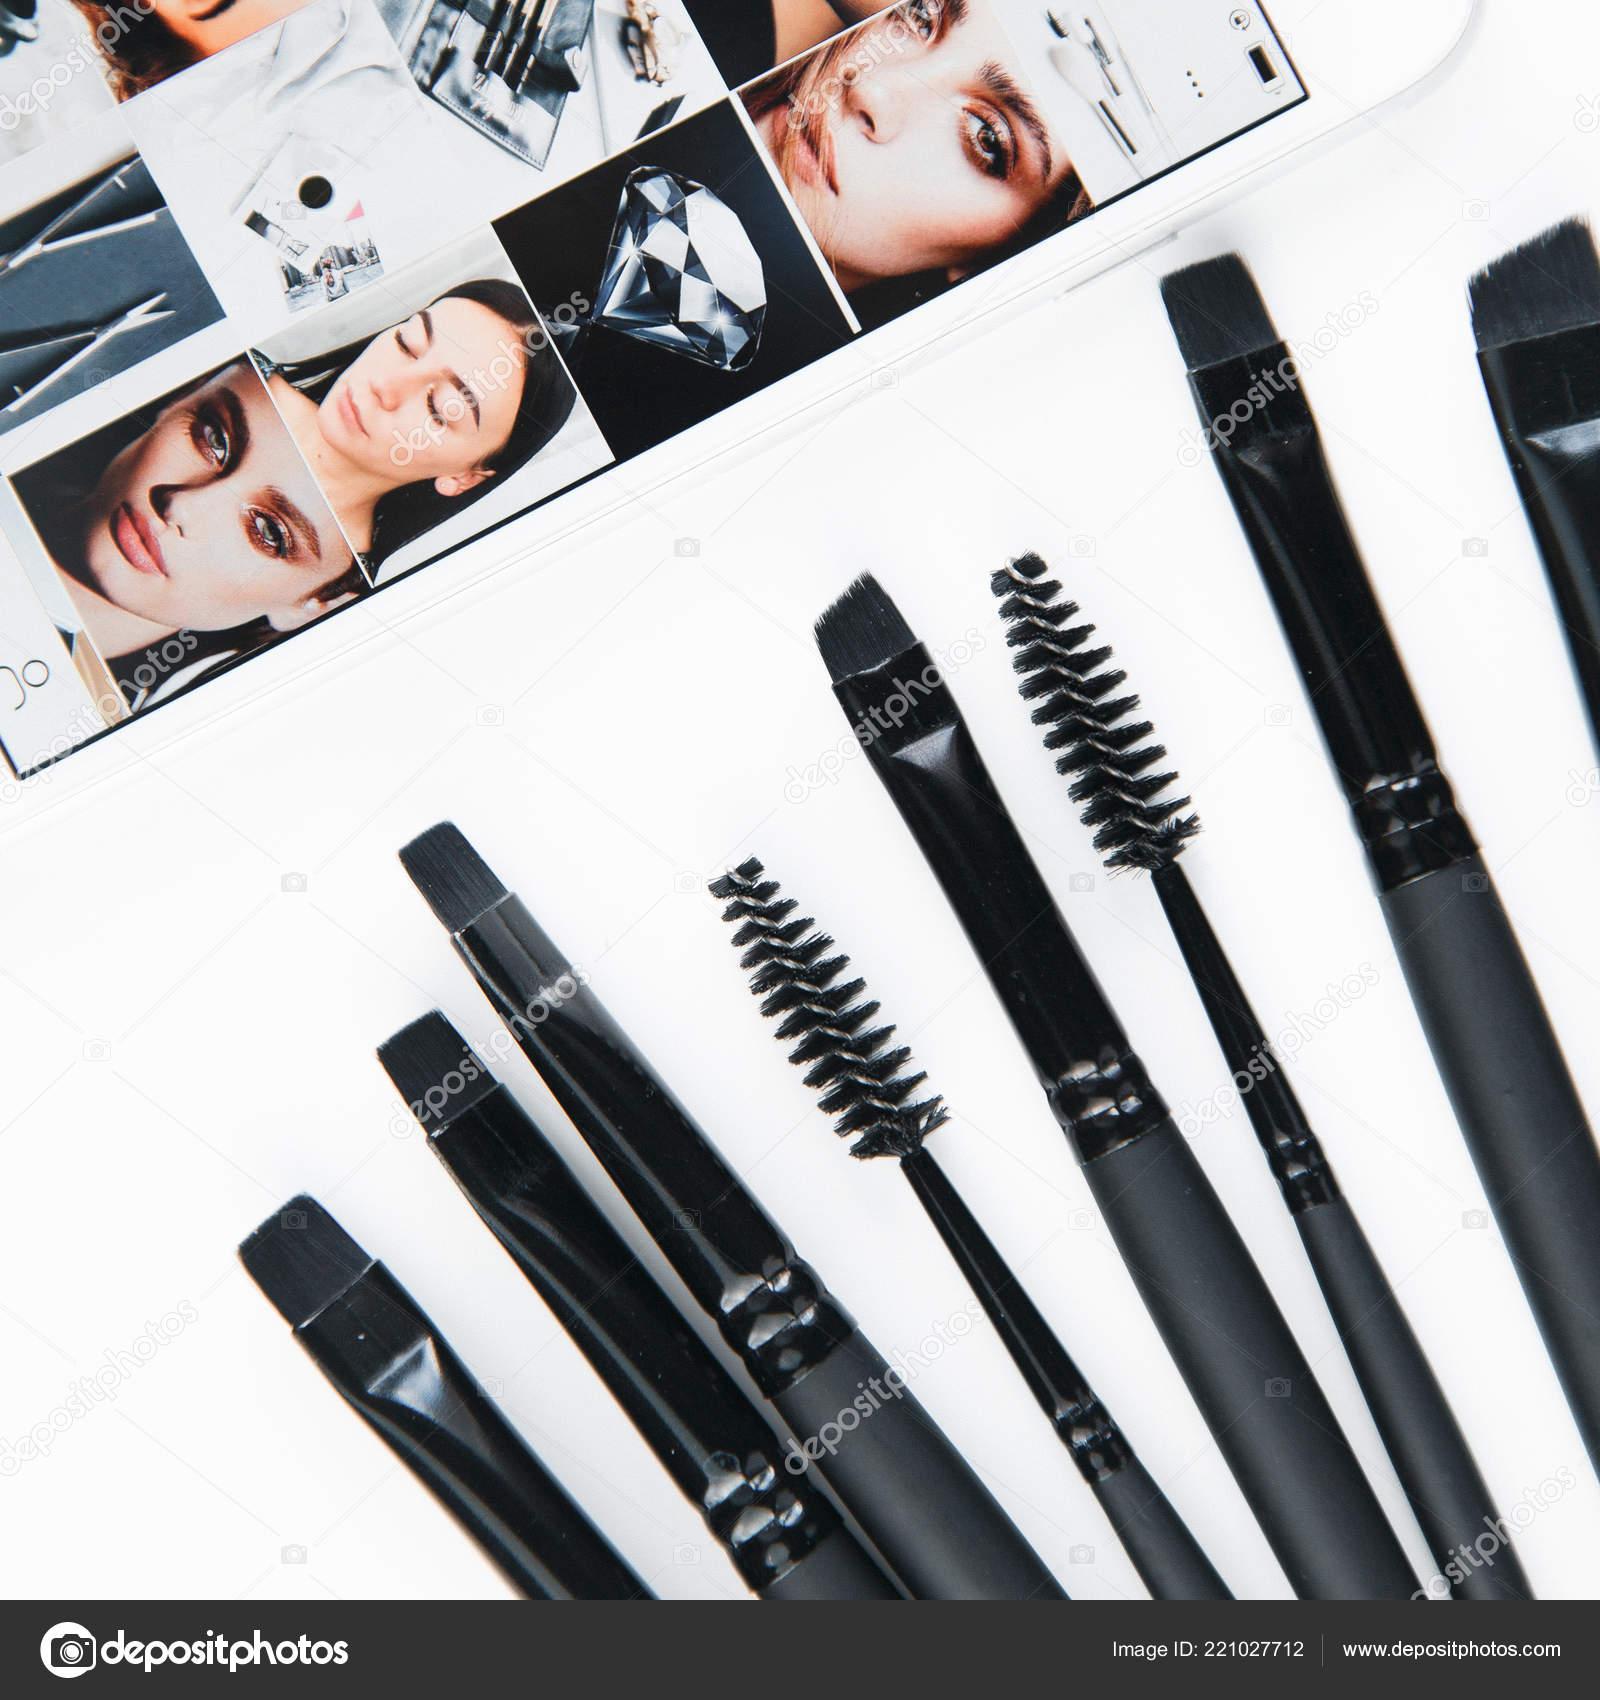 Brush Brow Makeup Artist Set Cut Bon